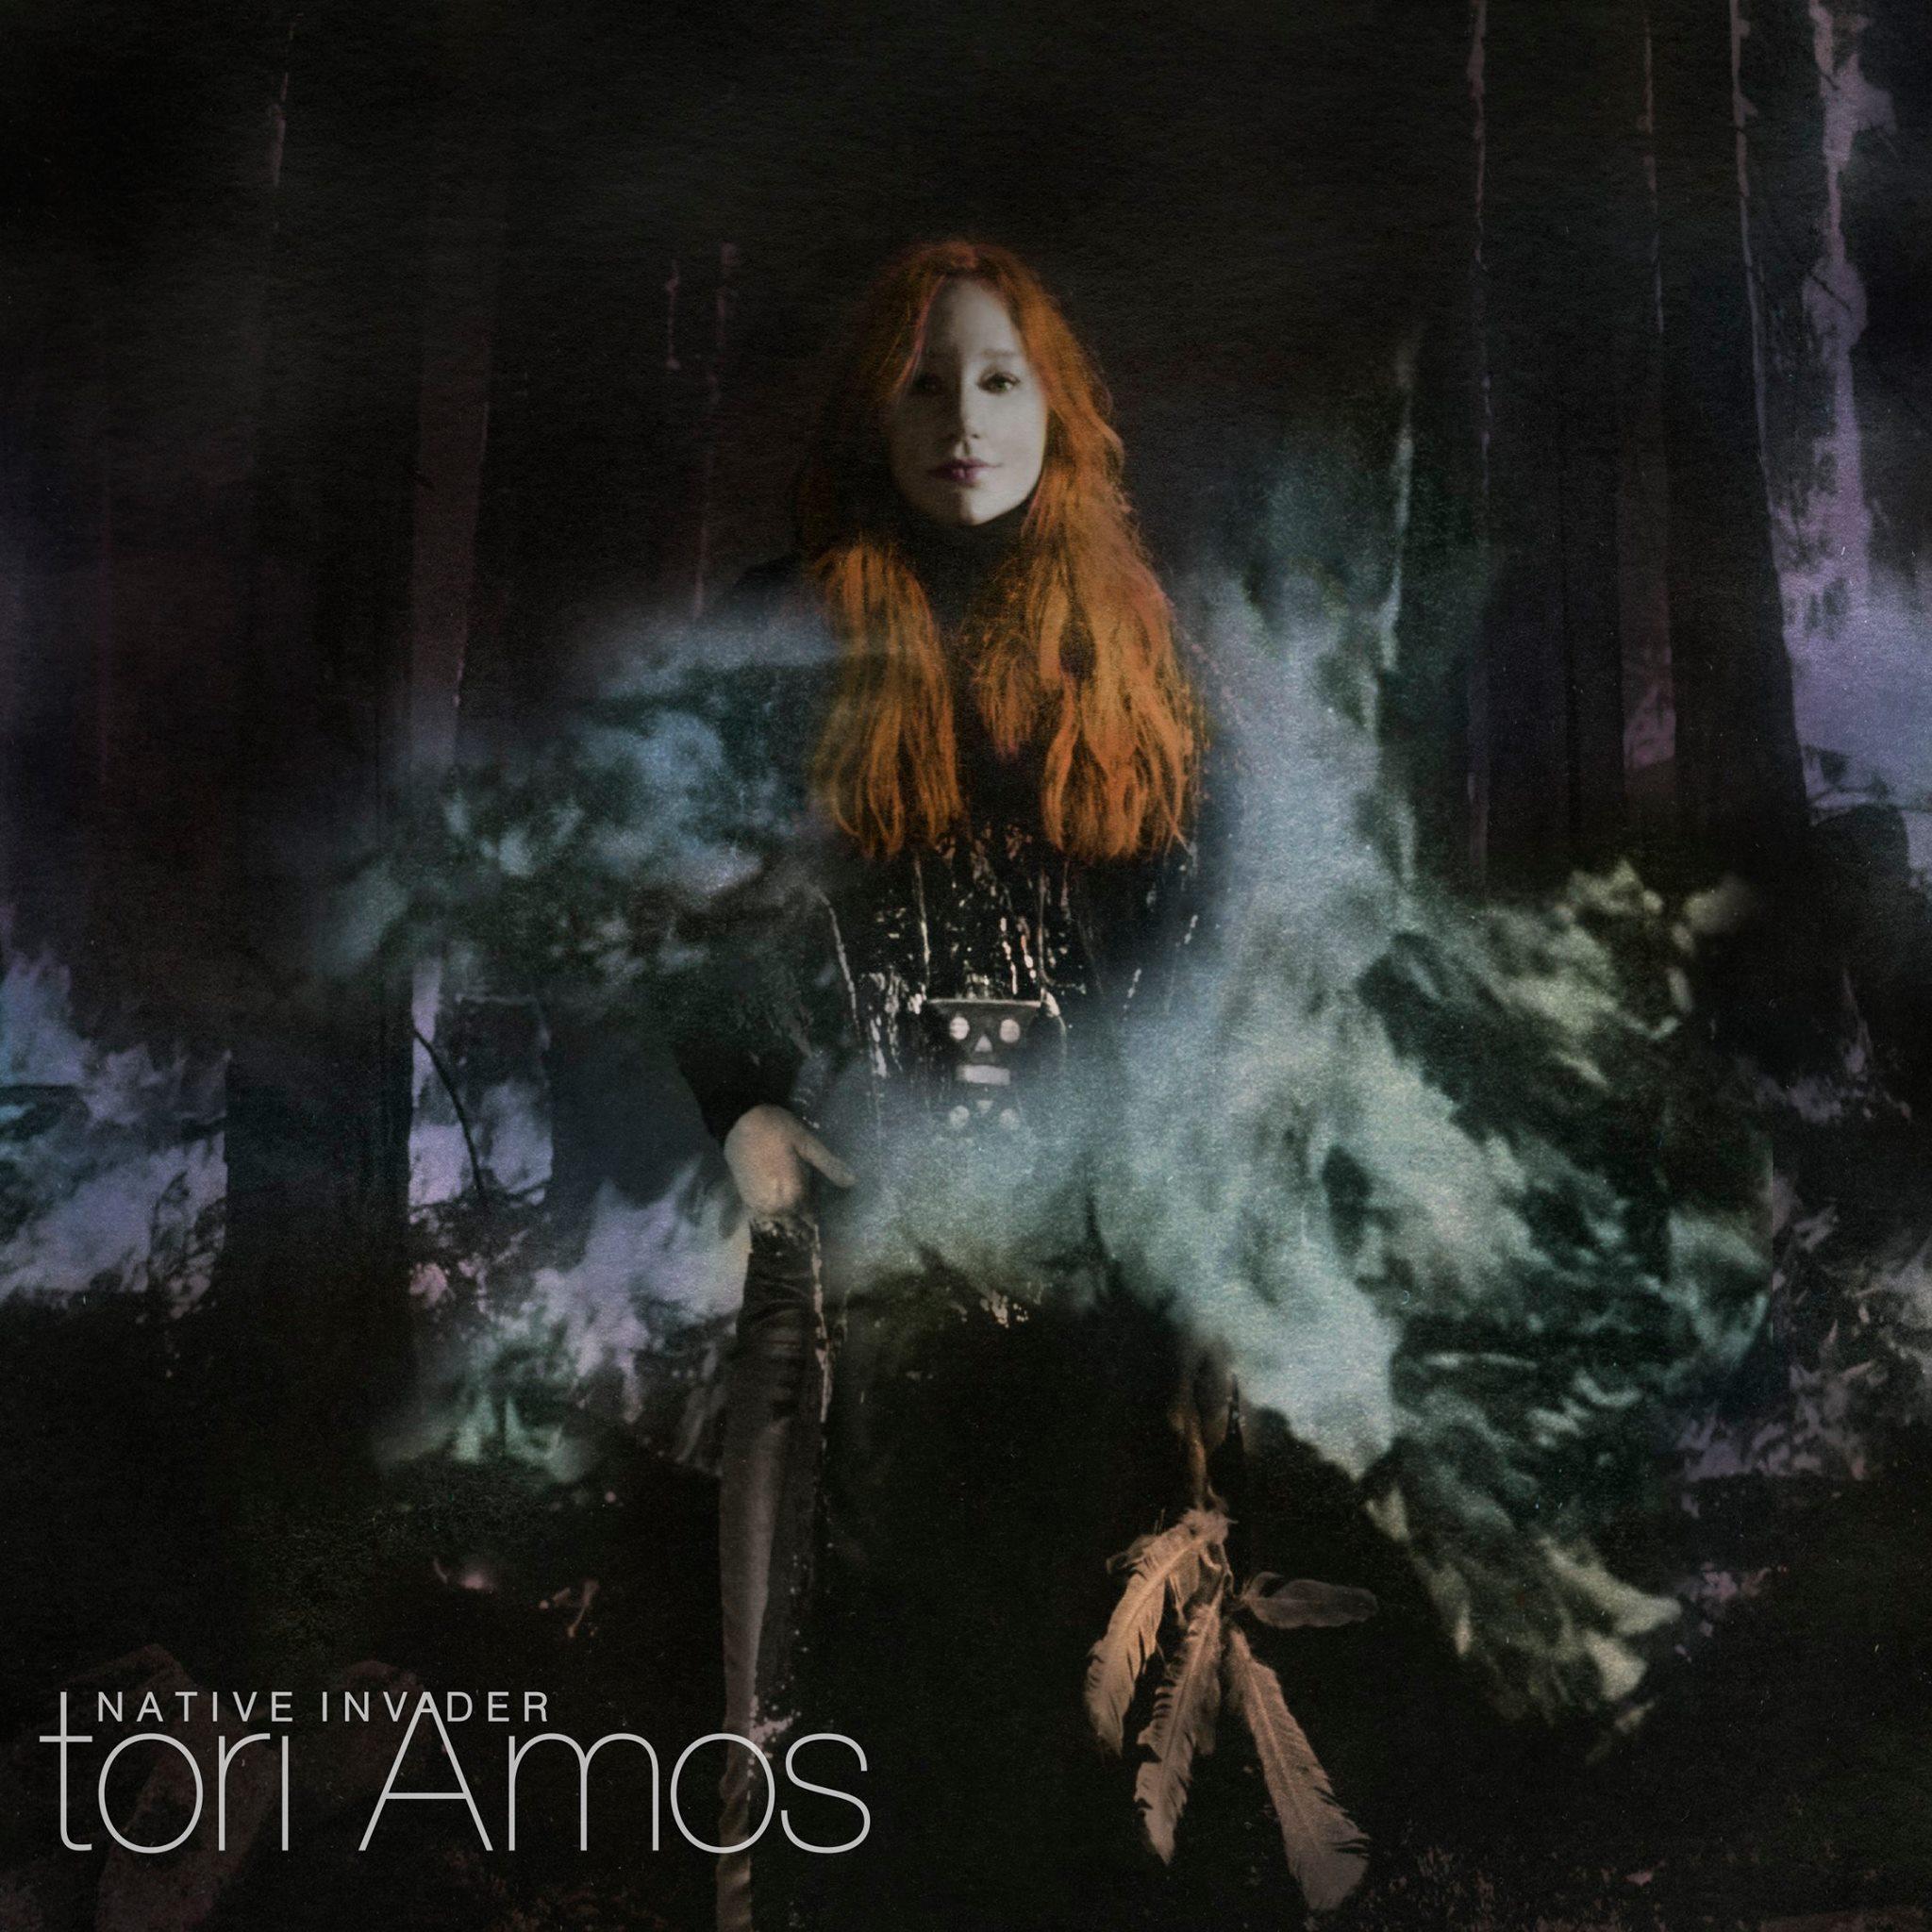 the song lyrics to Bang by Tori Amos